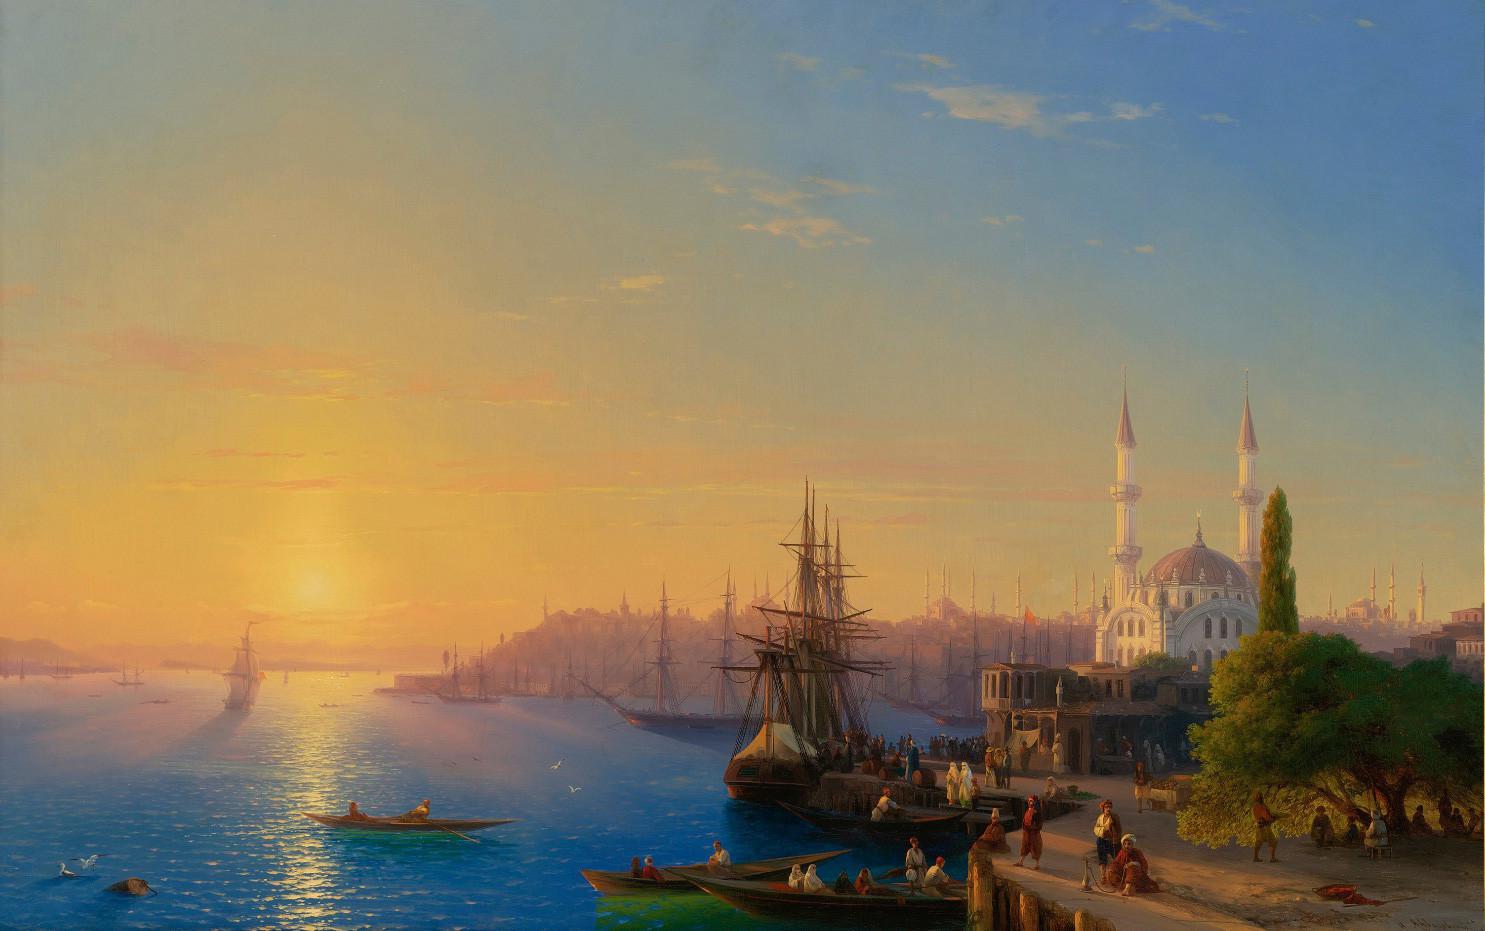 """Поглед на Цариград и Босфорски залив"""